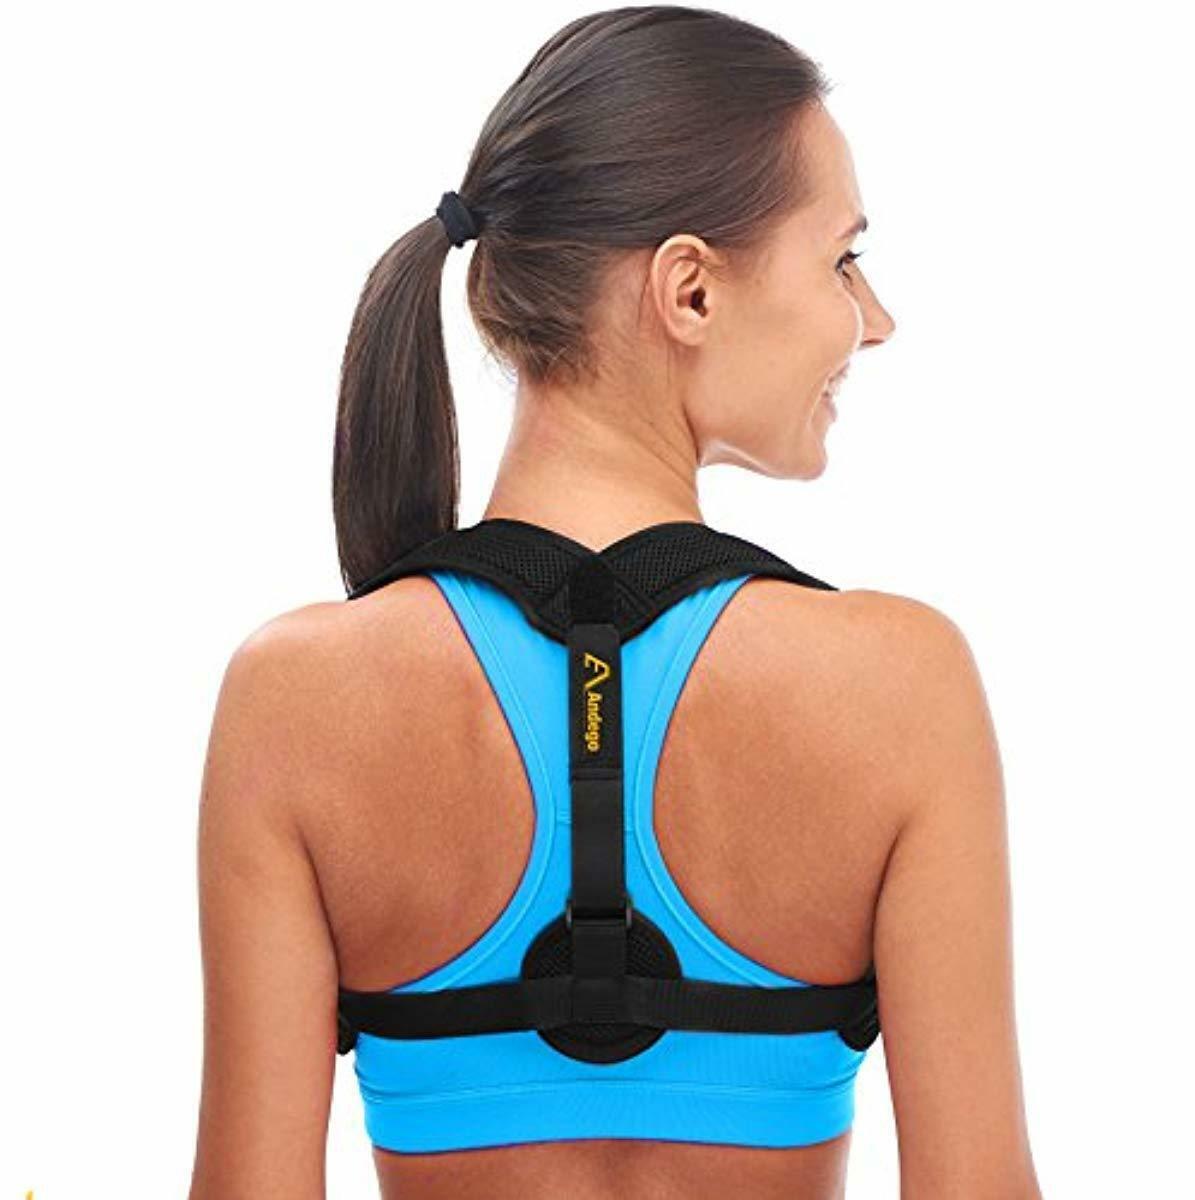 Andego Back Posture Corrector for Women & Men - Discreet Des